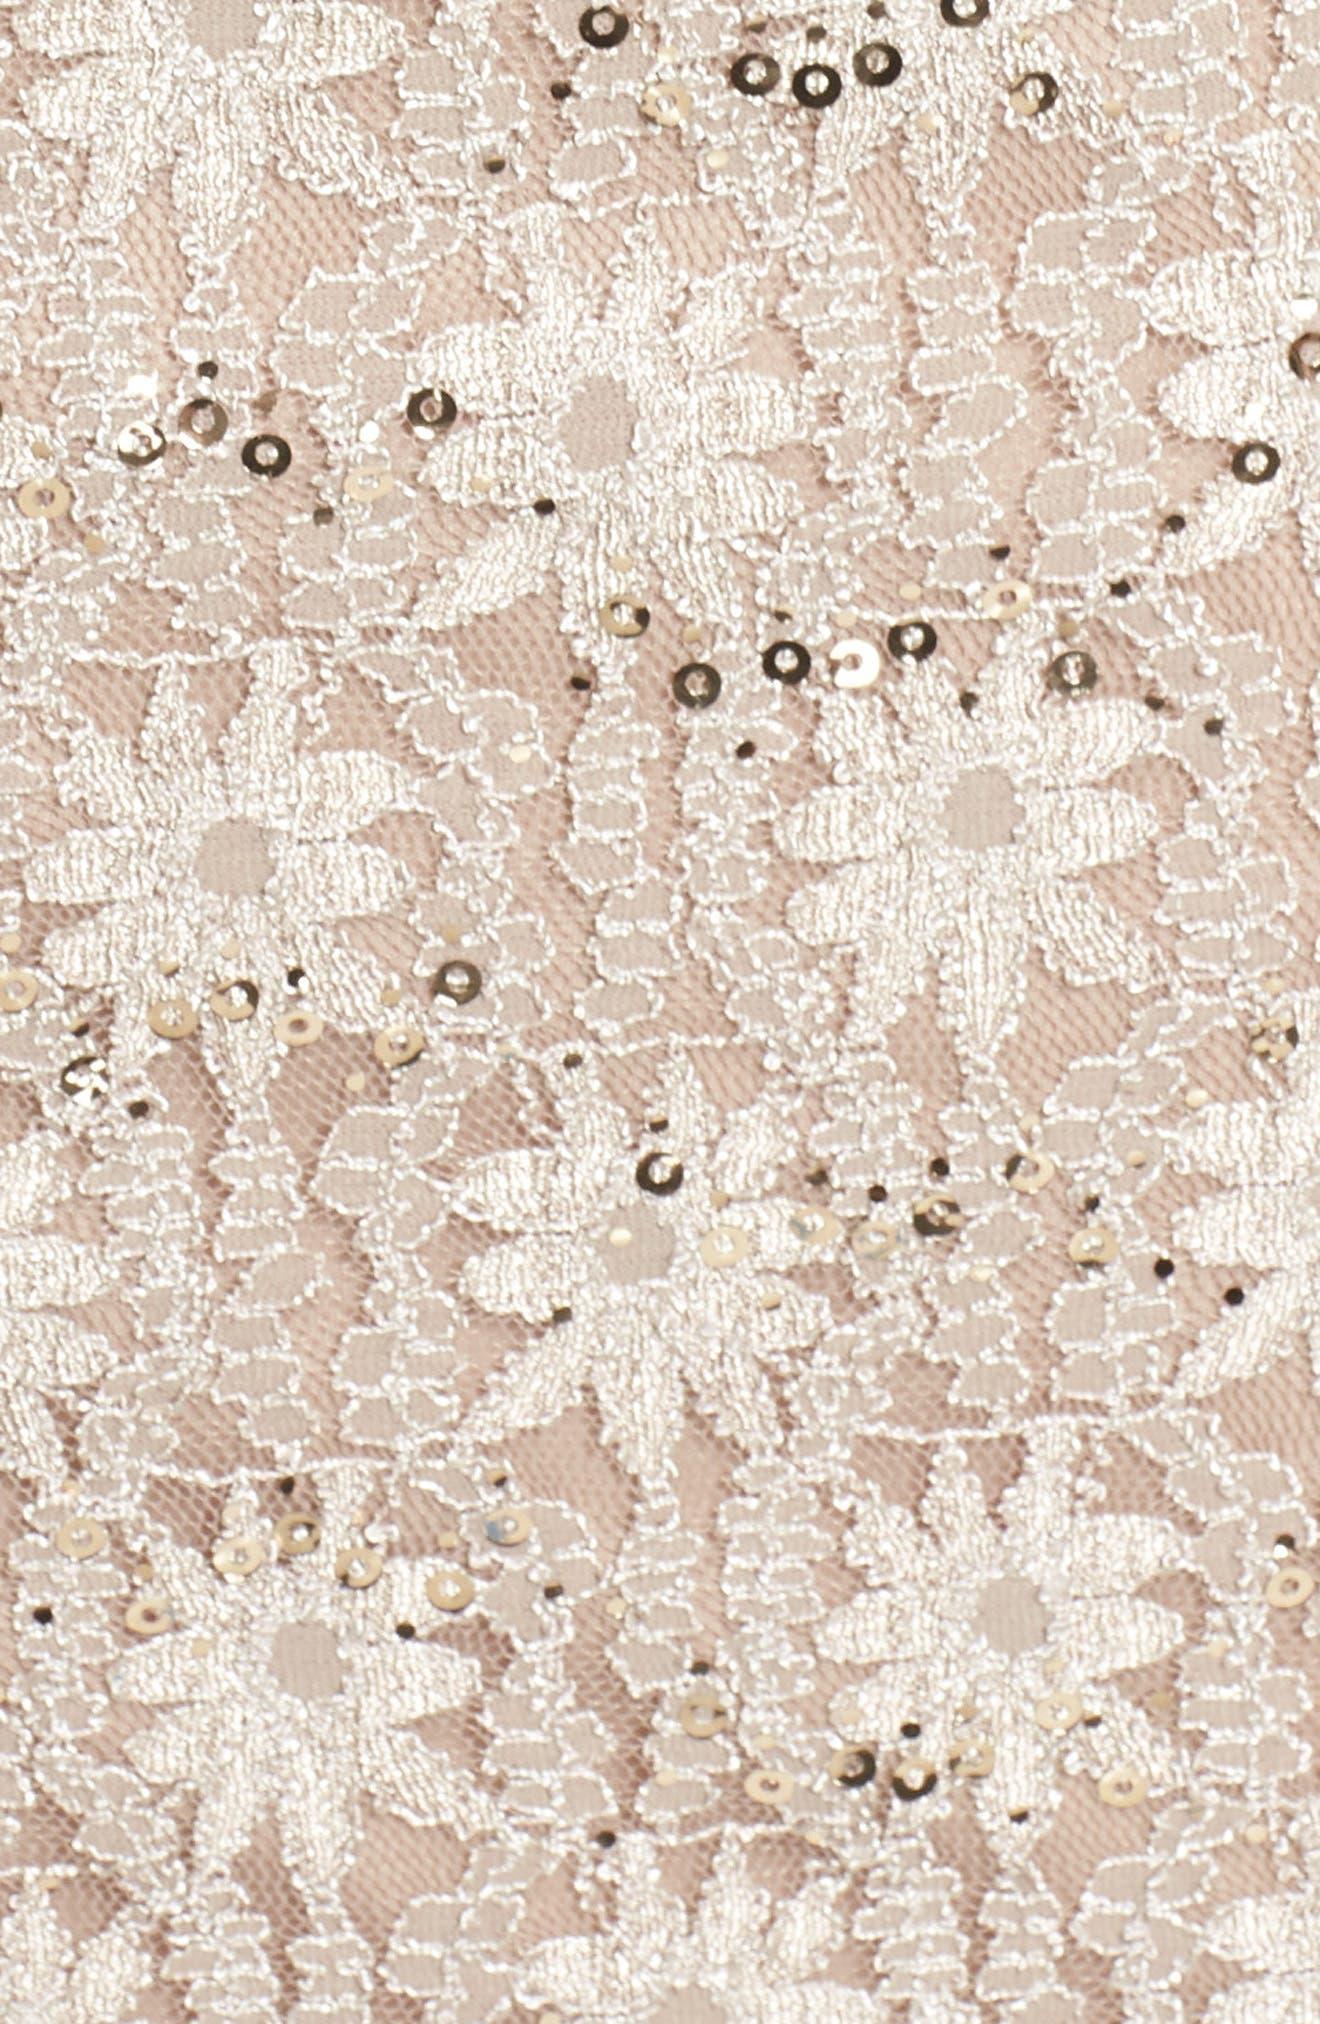 Embellished Illusion Lace Shift Dress,                             Alternate thumbnail 6, color,                             250